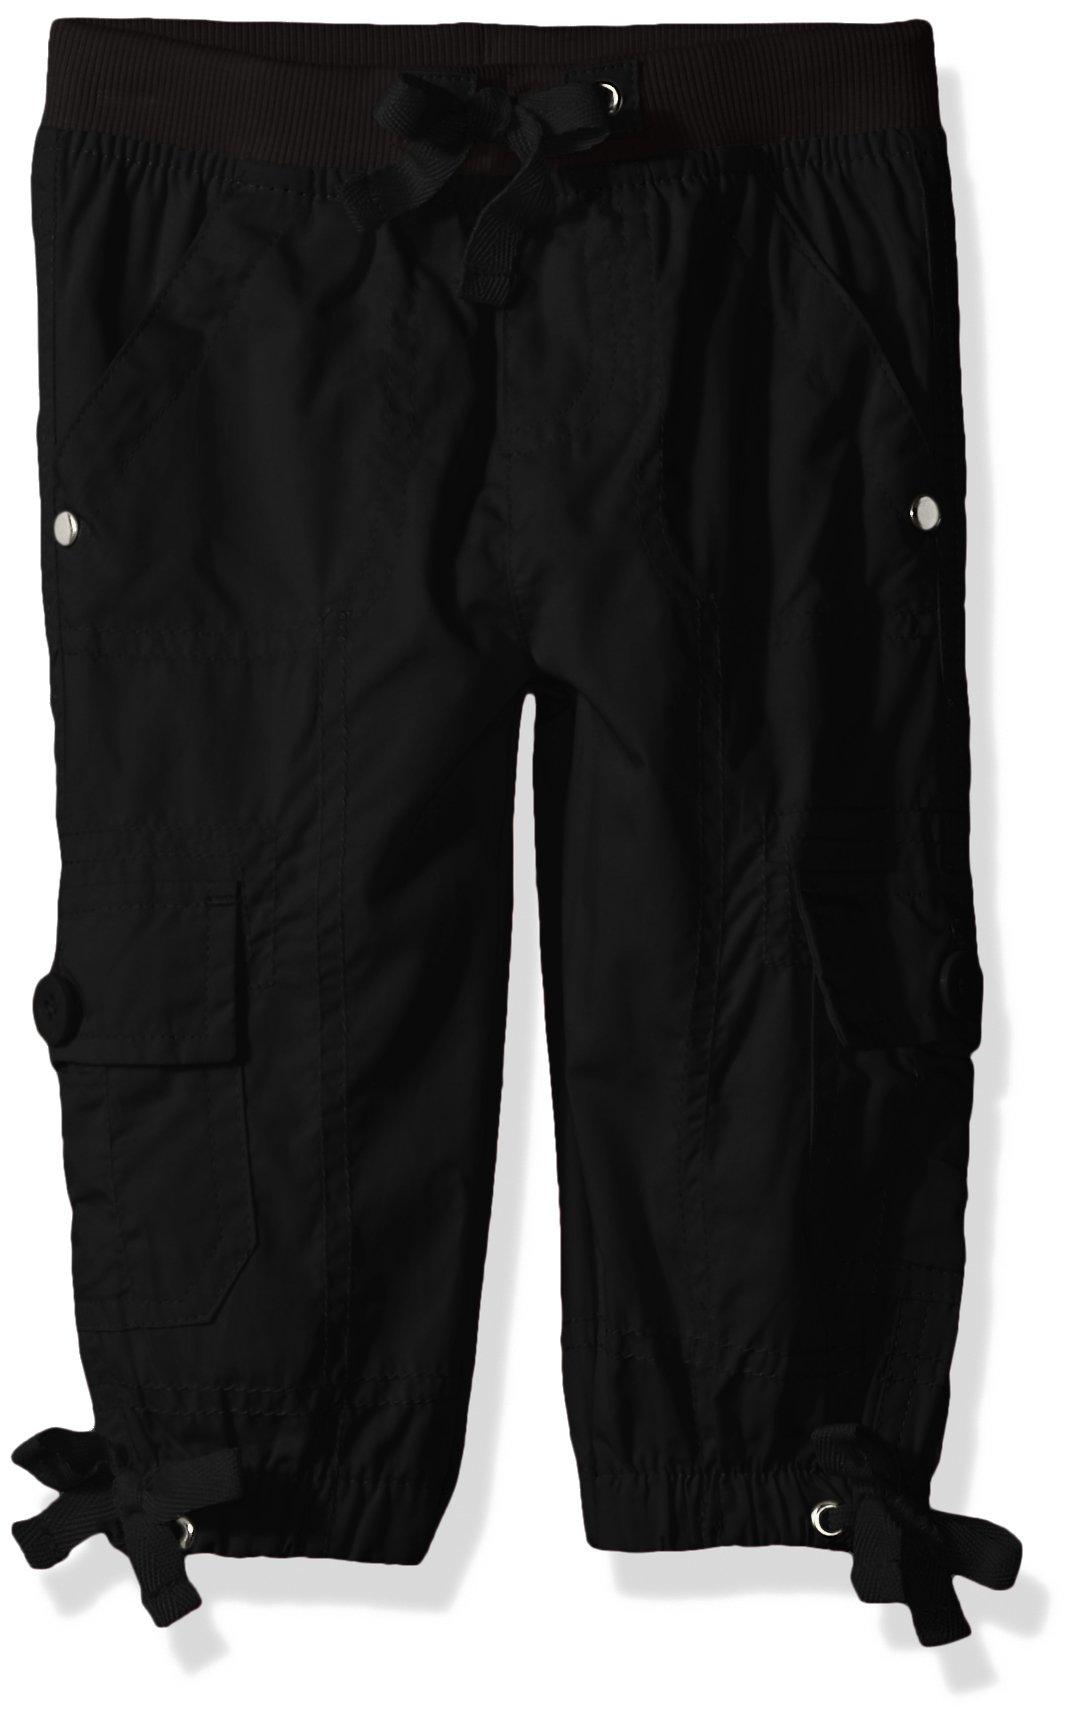 Limited Too Toddler Girls' Fleece Pant, Pull/on Rib Waist Cargo Capri Black, 2T